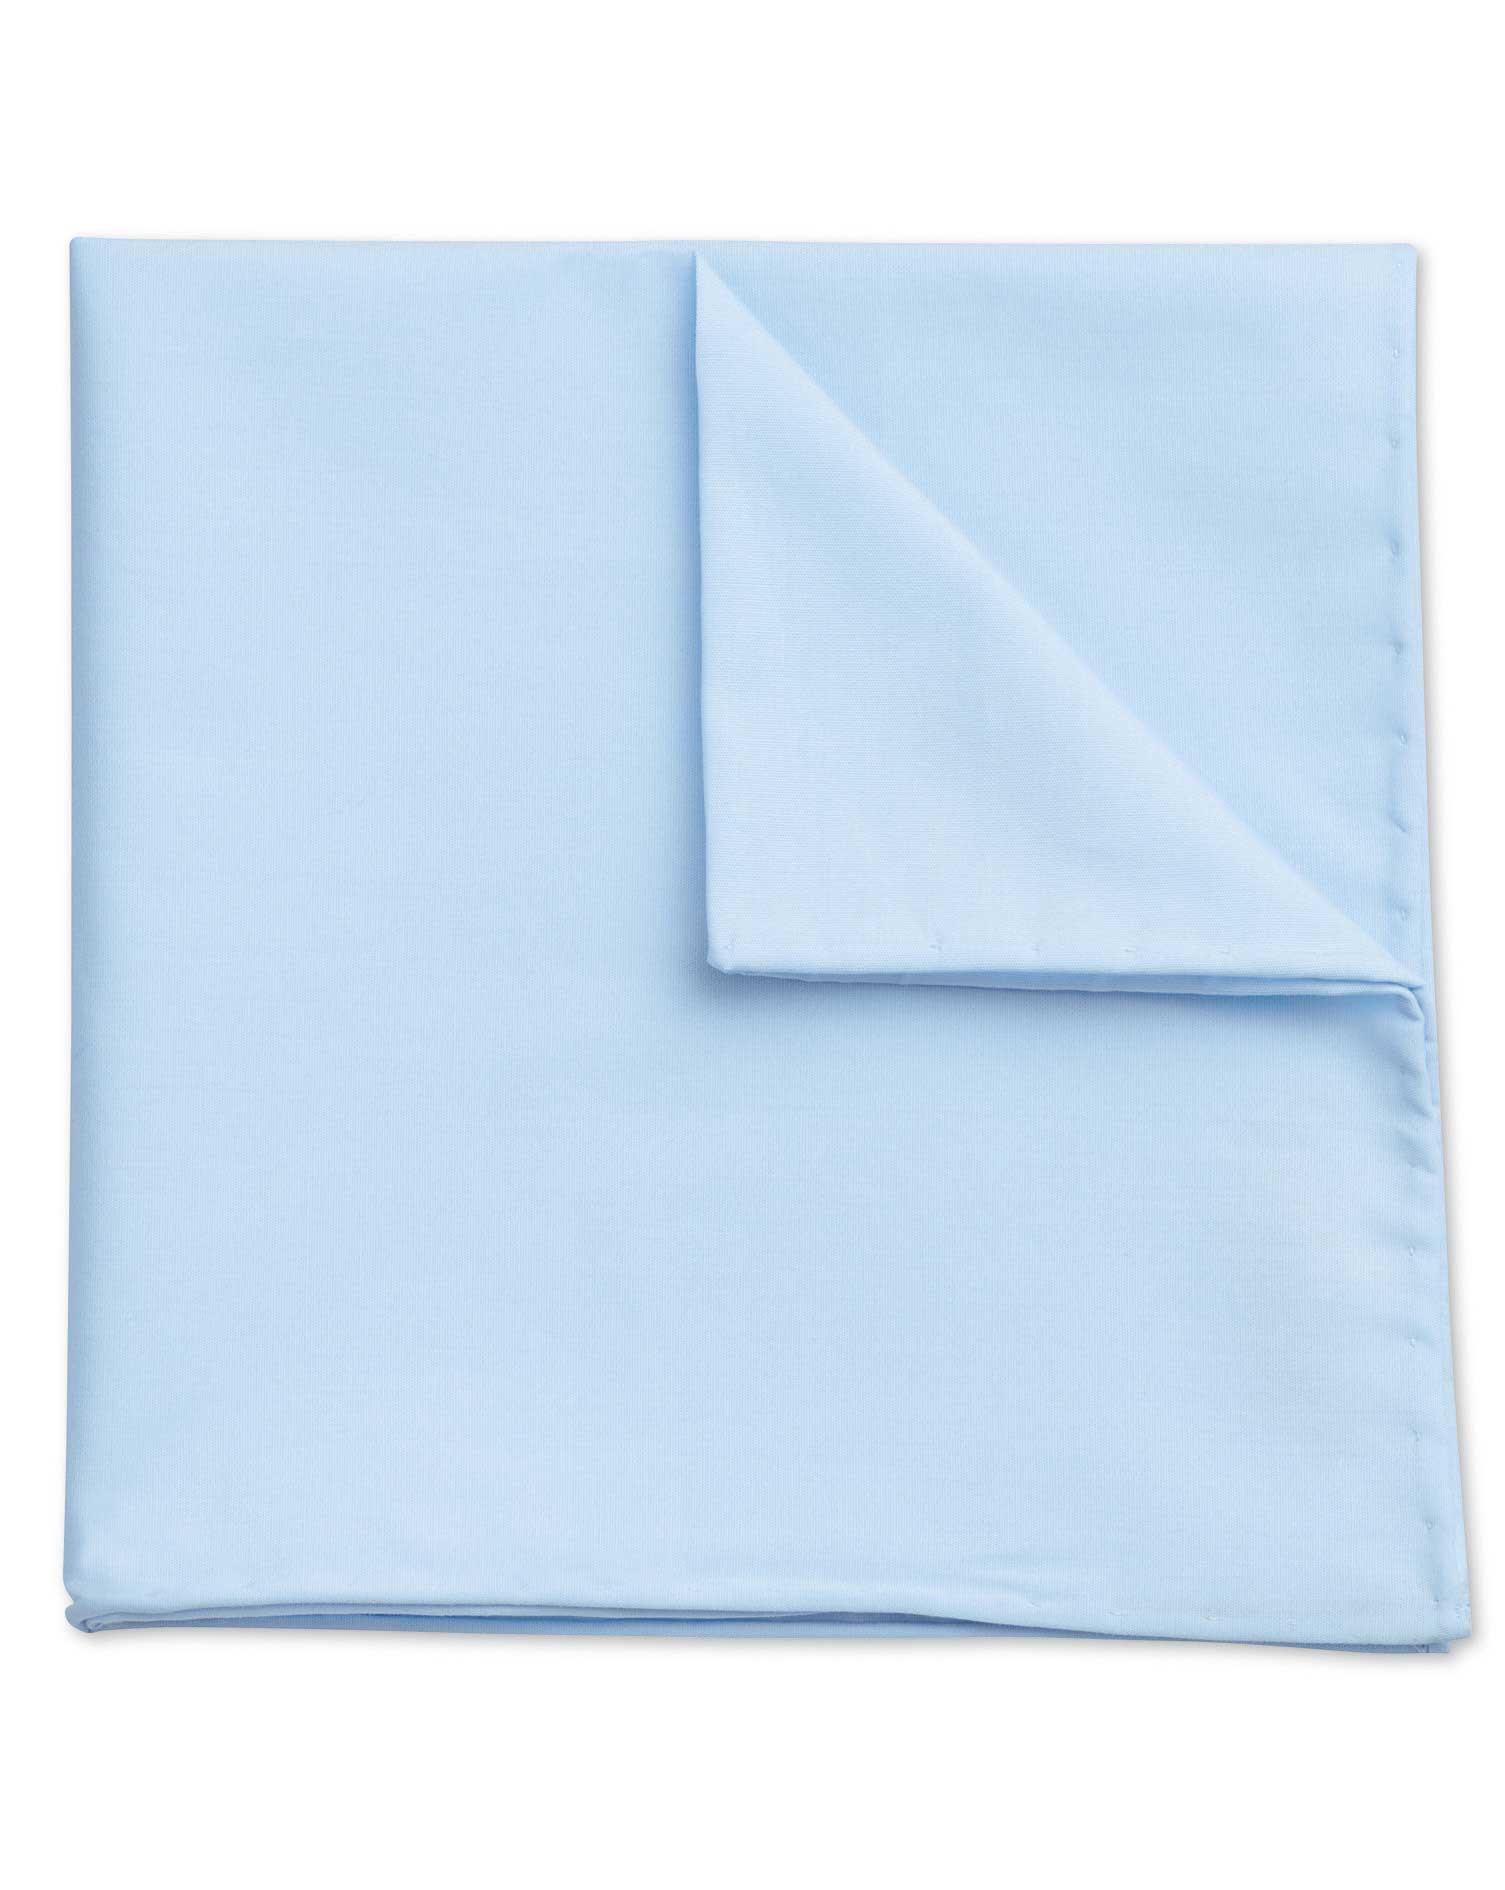 Sky Blue Classic Plain Cotton Pocket Square Size OSFA by Charles Tyrwhitt